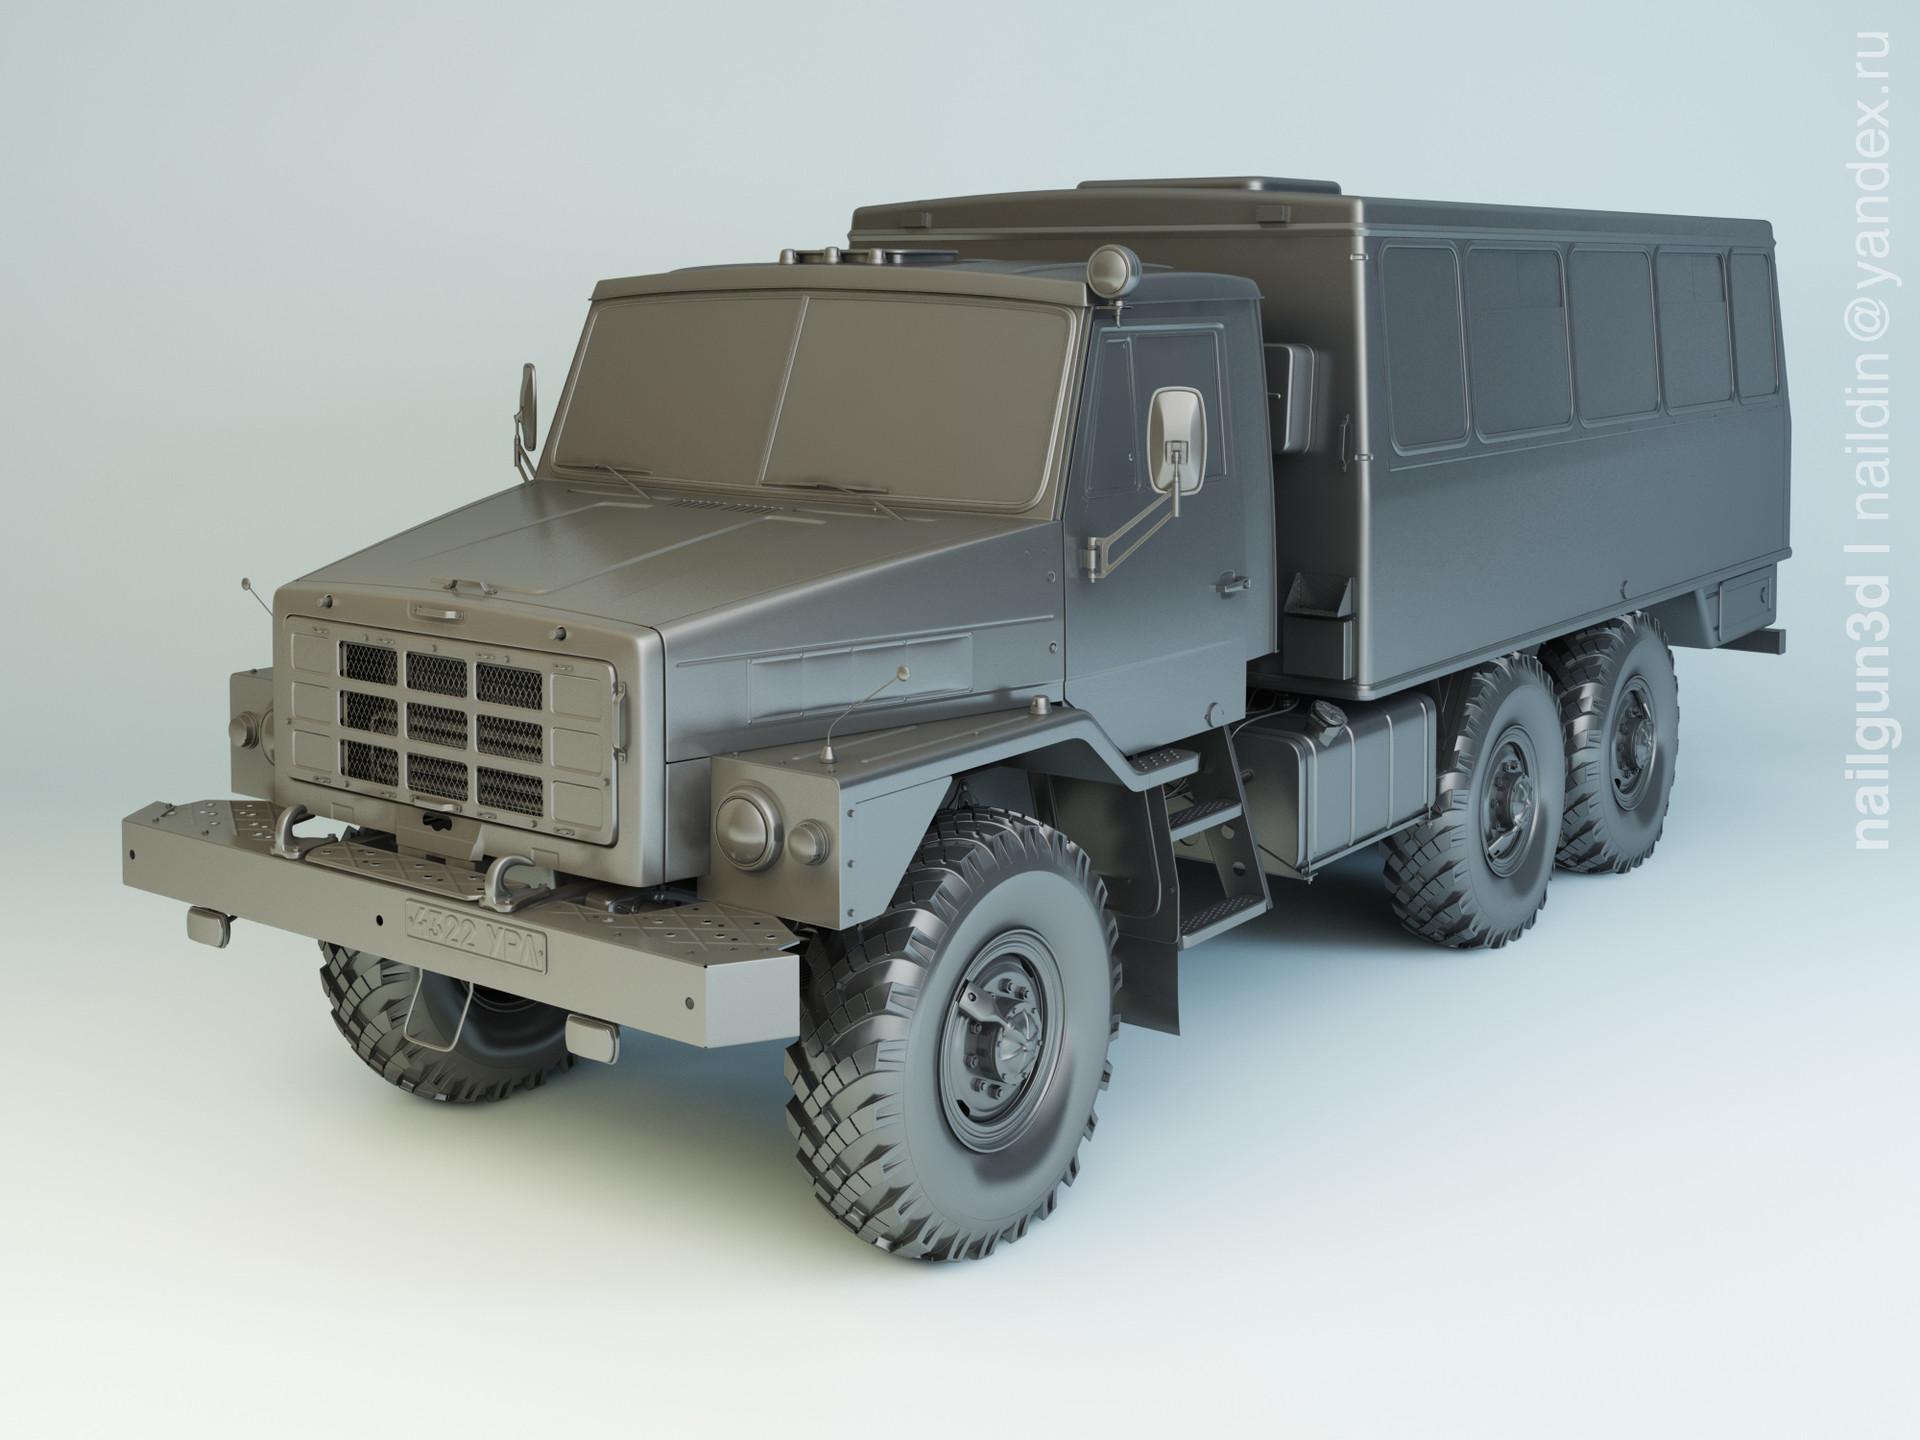 Nail khusnutdinov salg 002 002 ural 4322 modelling 0